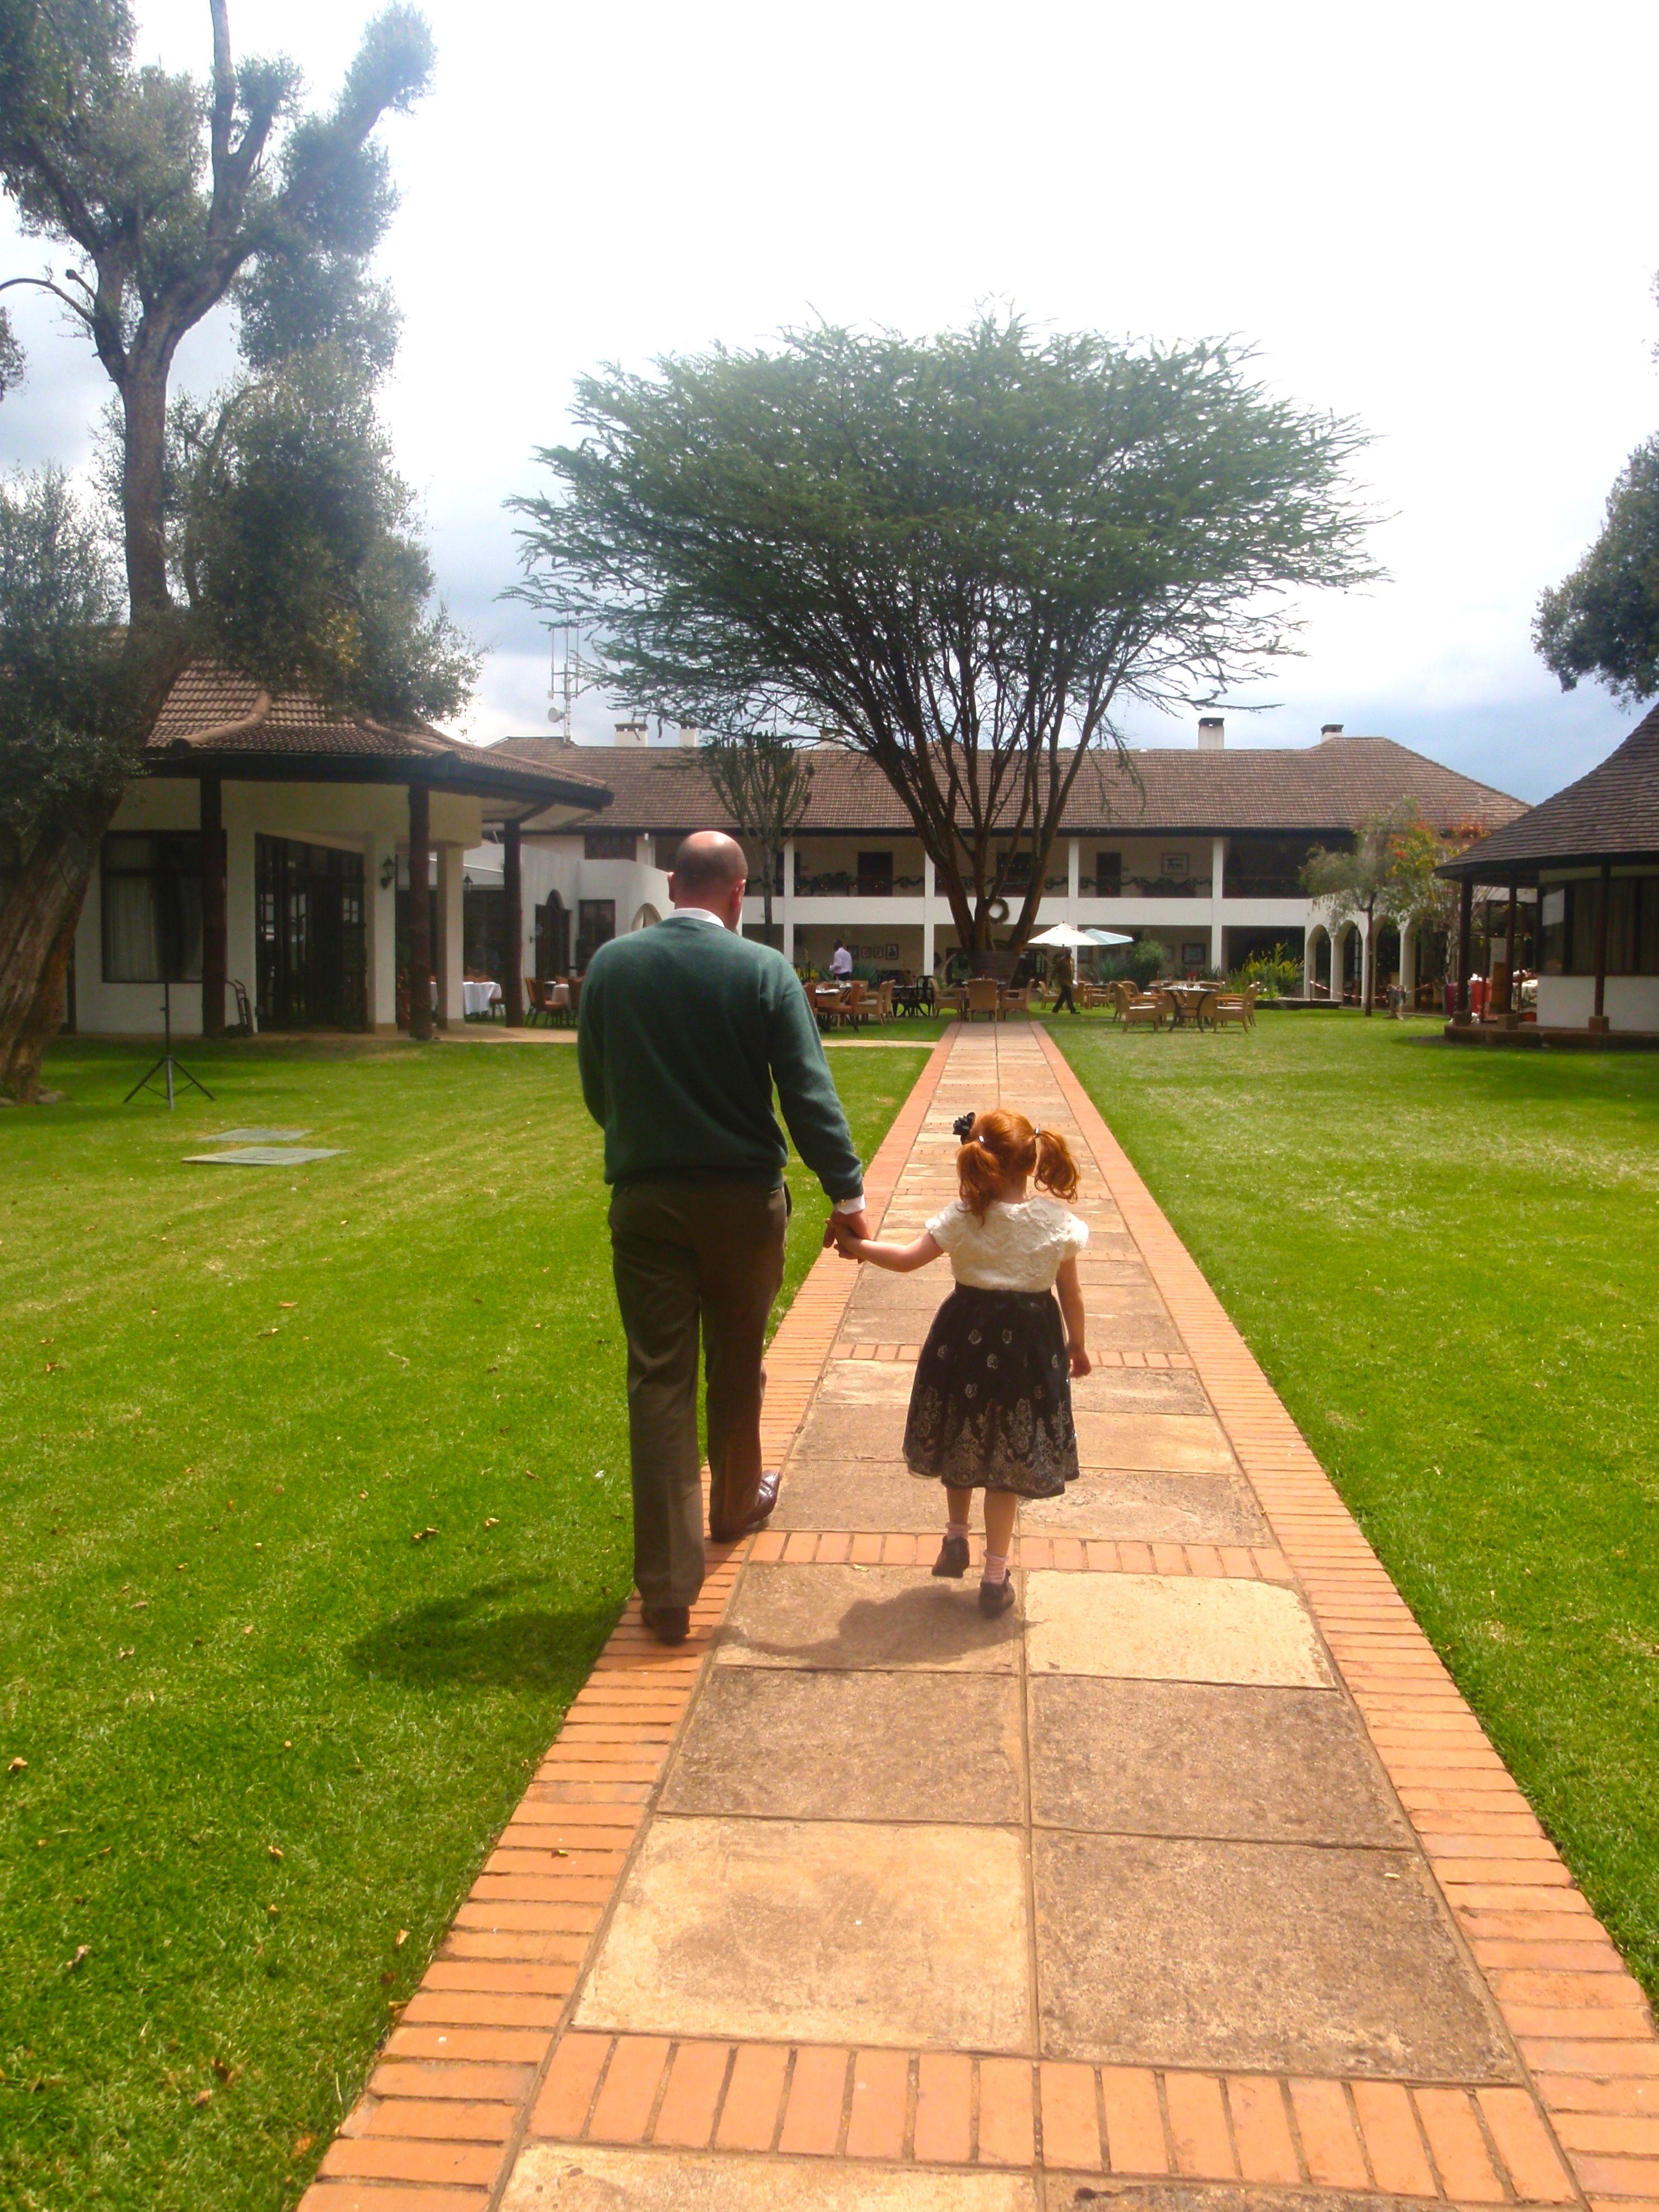 Fairmont Mt Kenya Safari Club Is Built On The Line Of The Equator